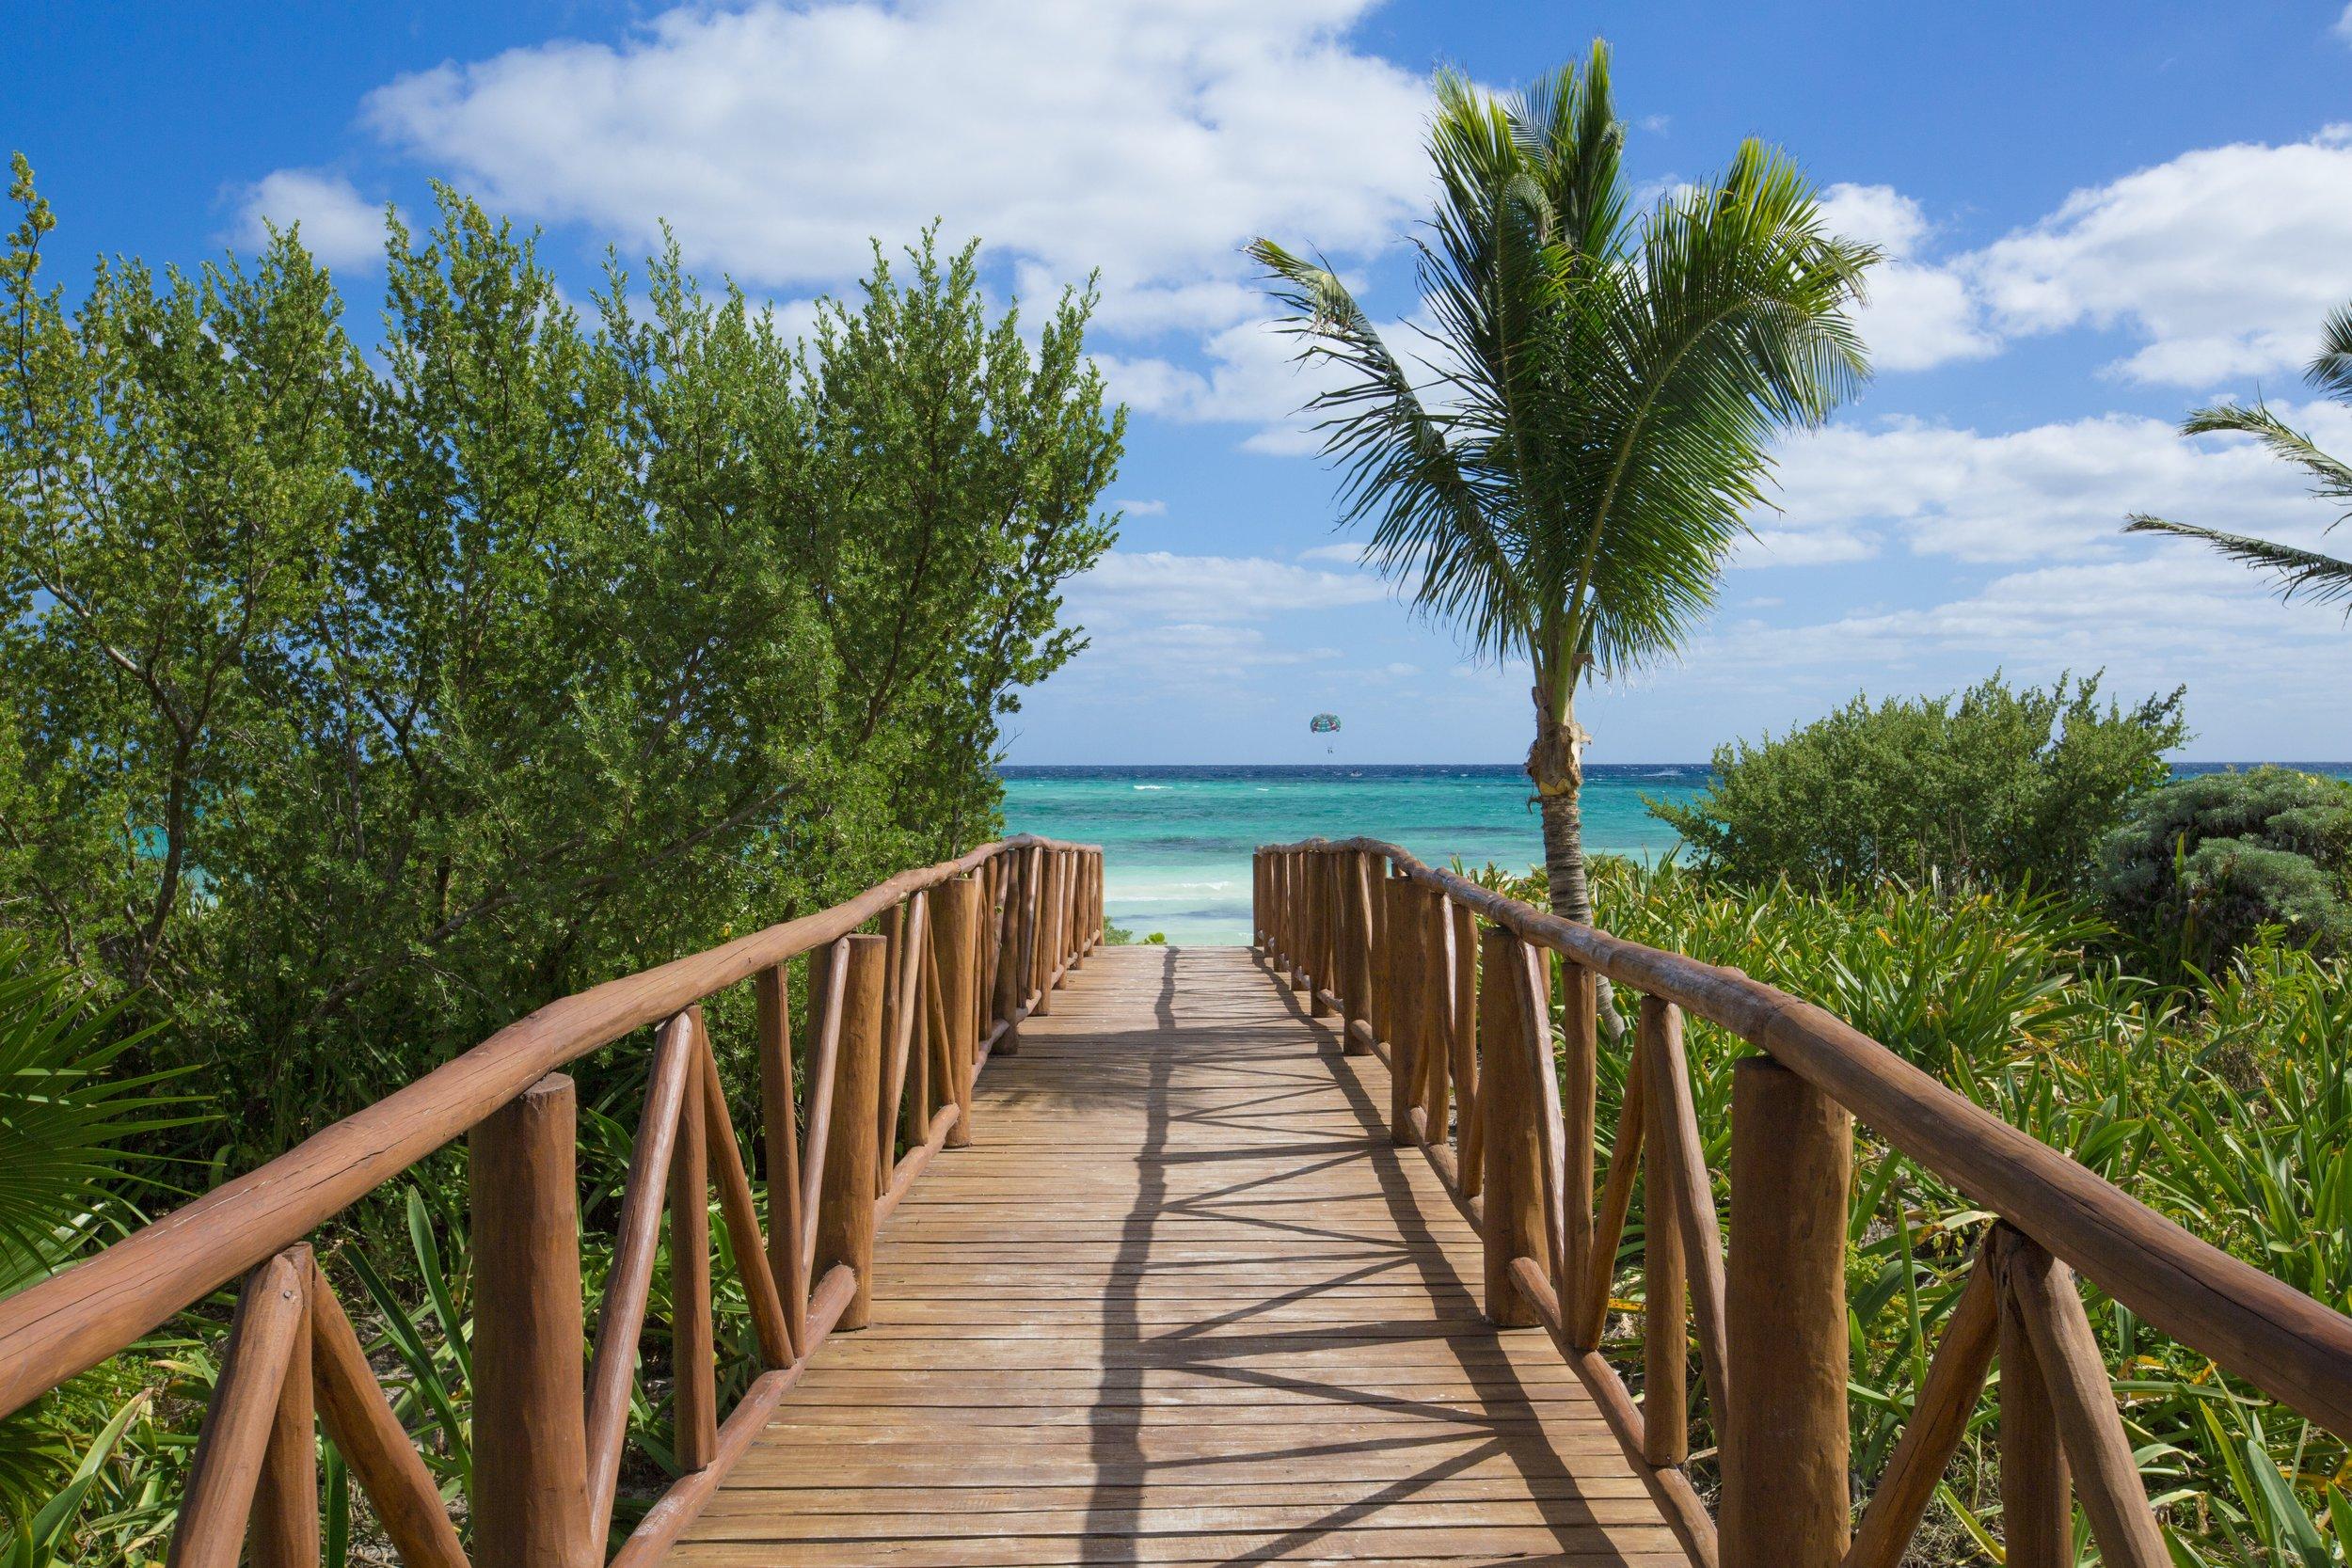 Walkway to beach (1).jpg